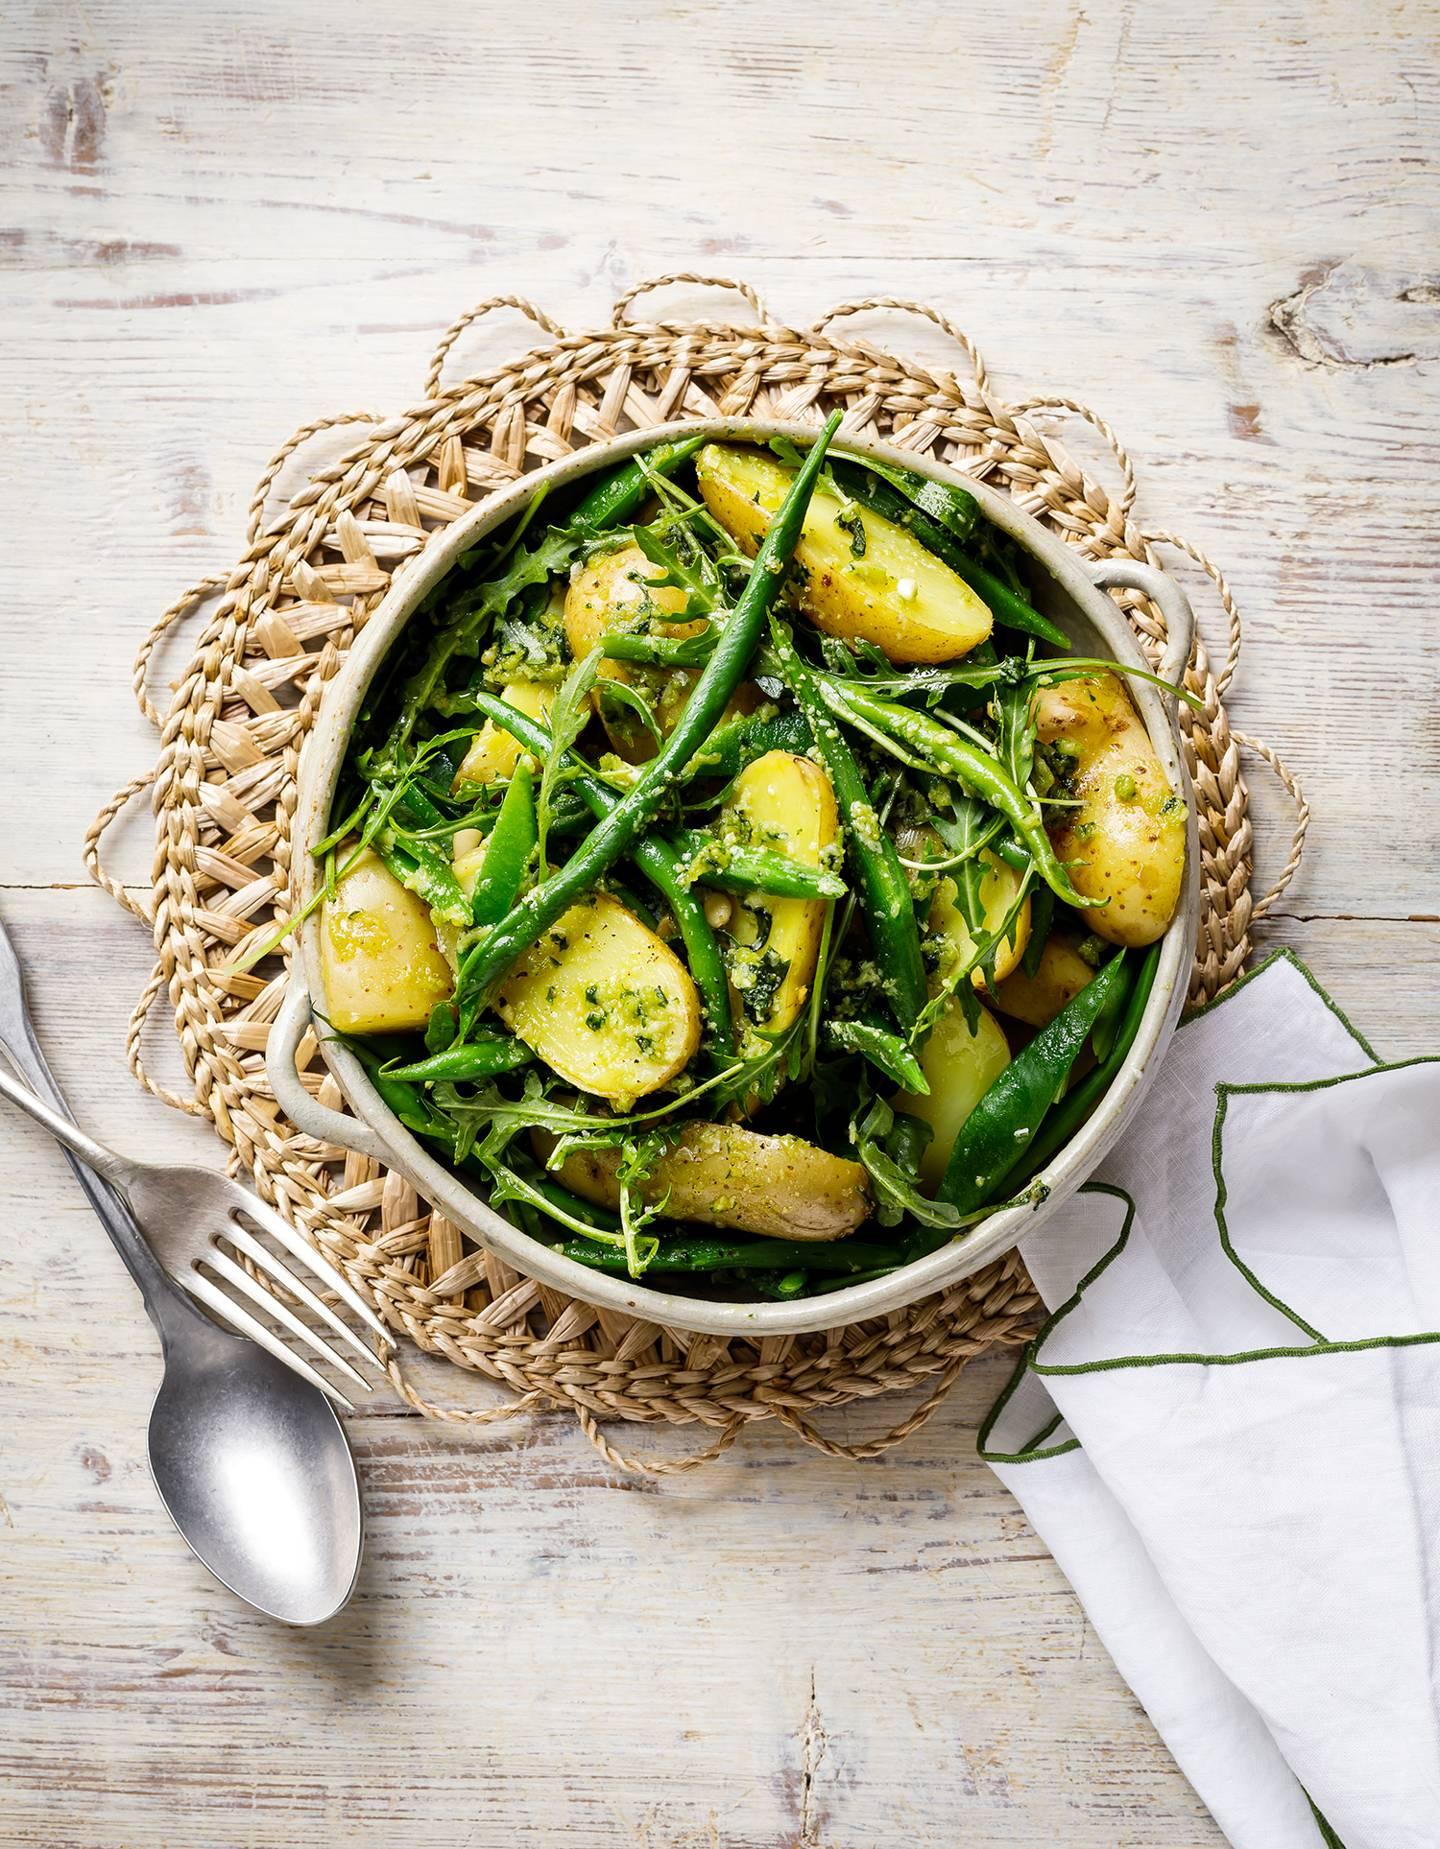 Potatoes, green beans and pesto